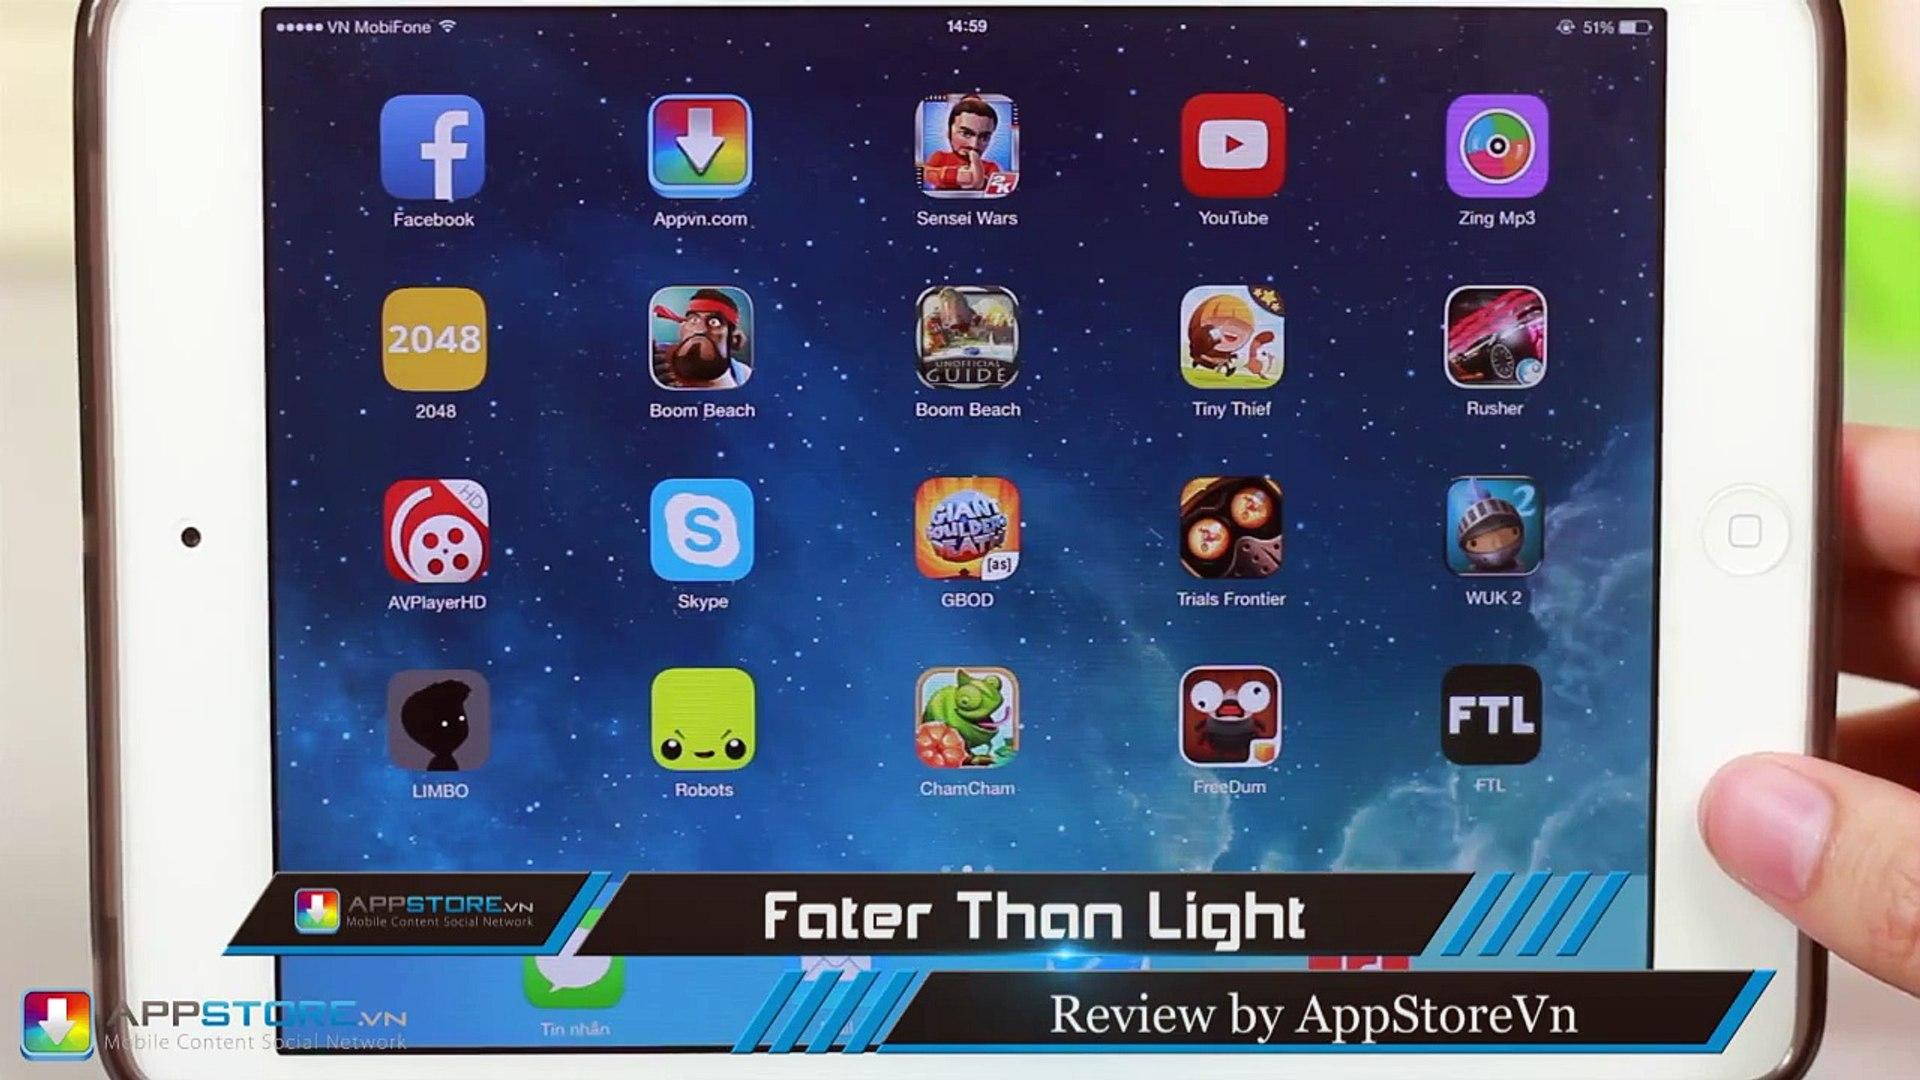 [iOS Game] Faster than light - Chiến tranh vũ trụ - AppStoreVn